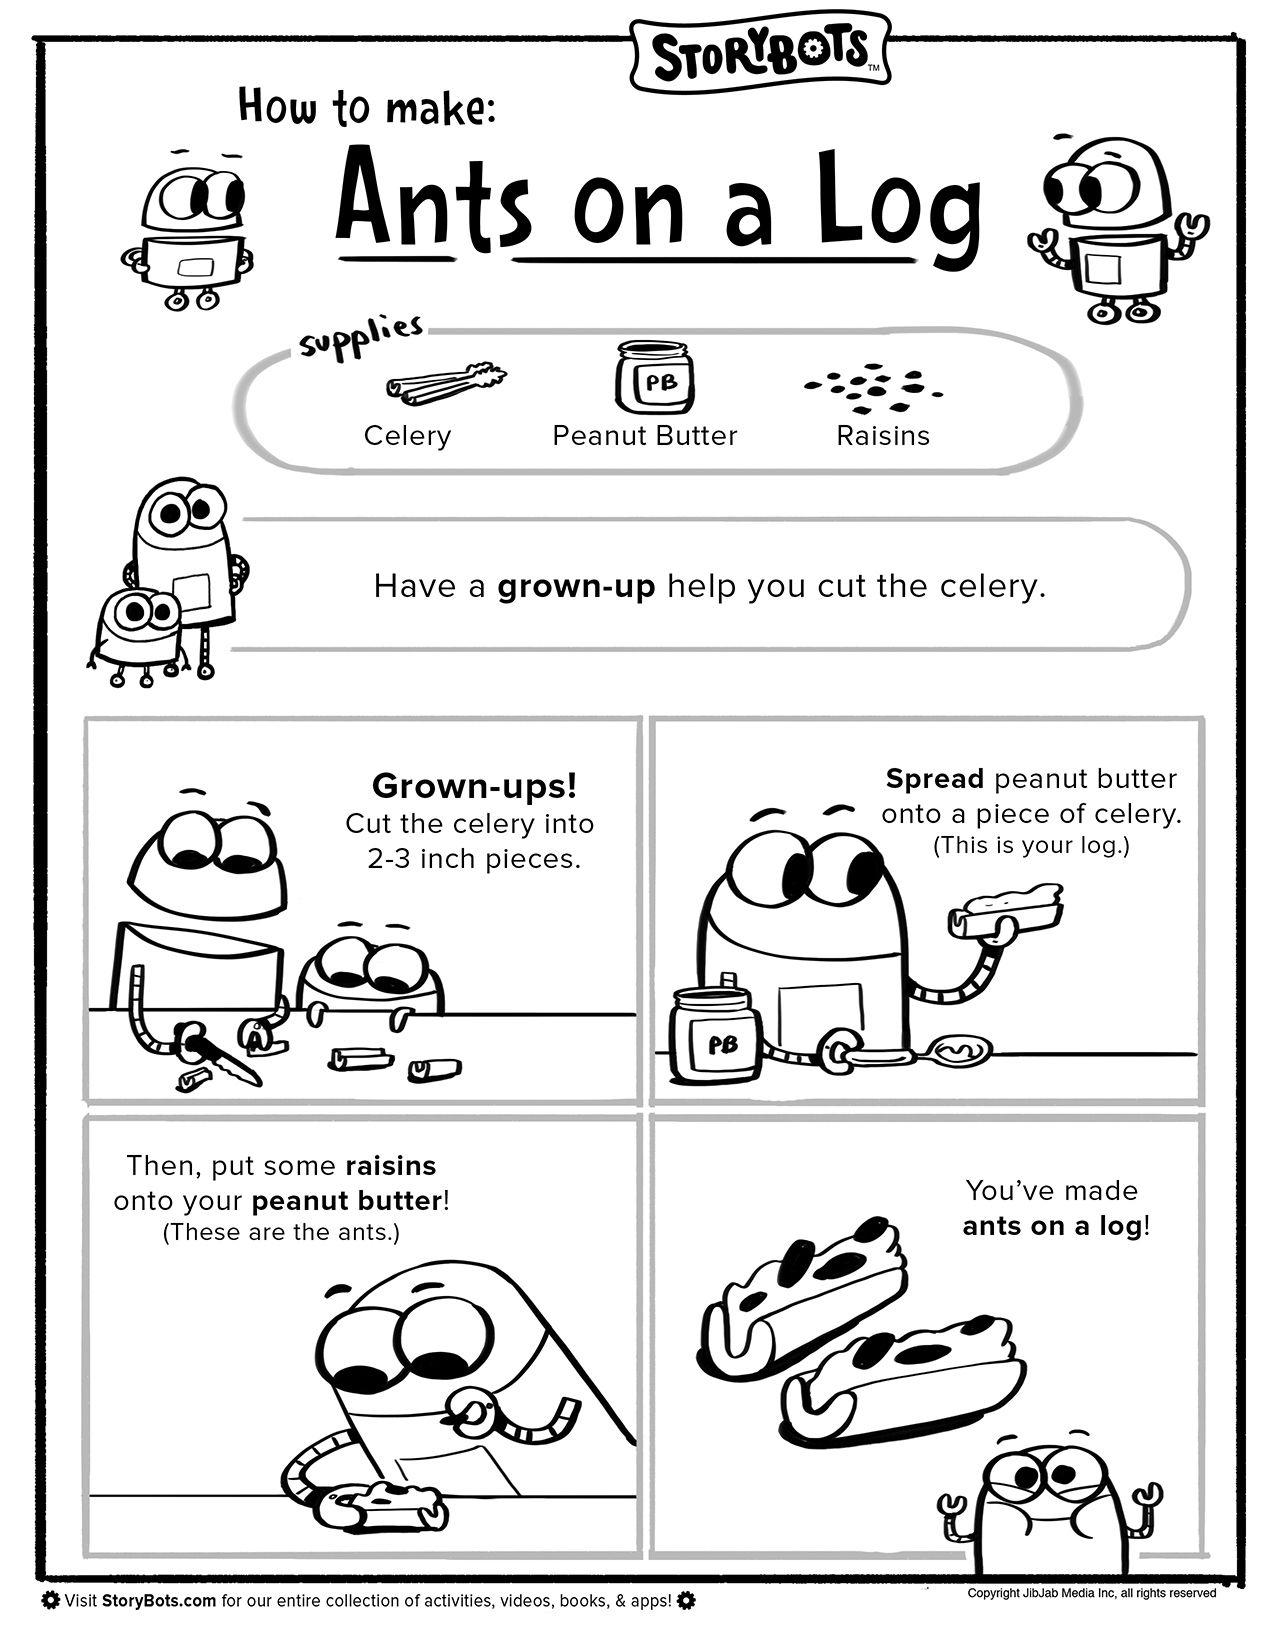 Make Ants On A Log